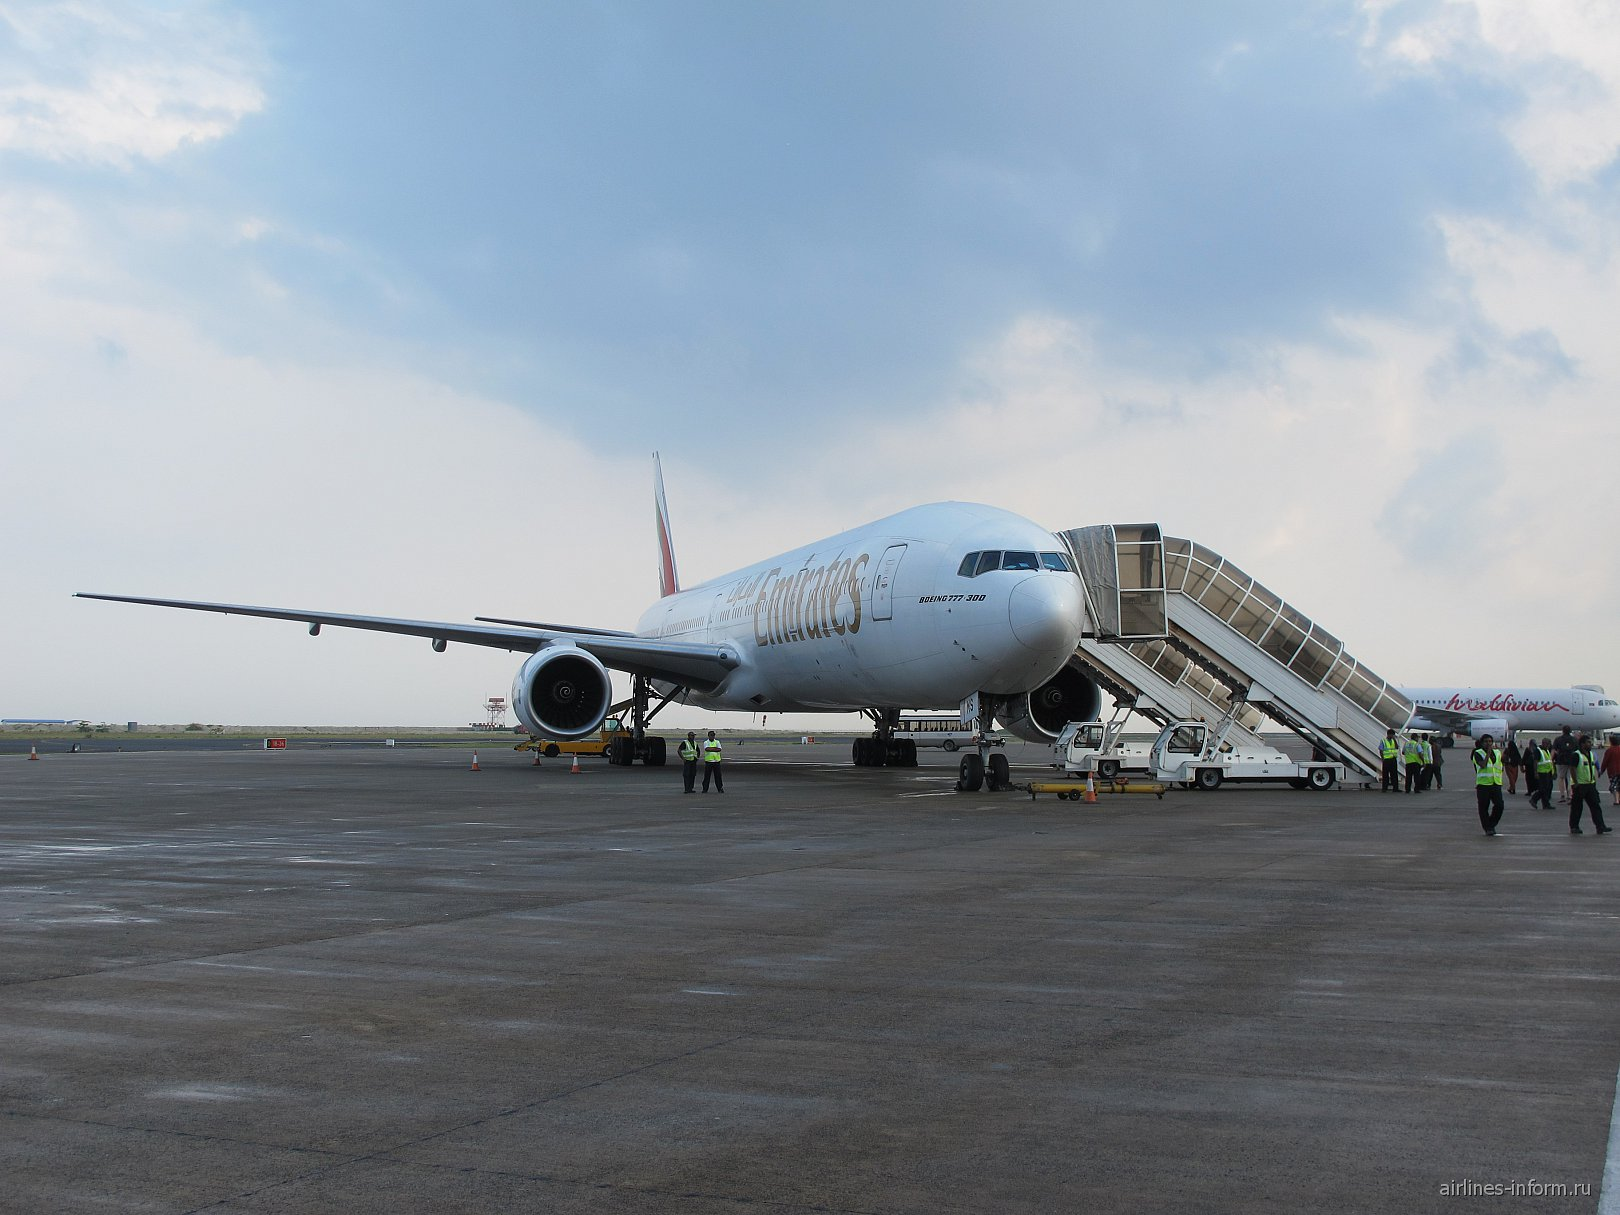 Boeing 777-300 авиакомпании Emirates в аэропорту Мале